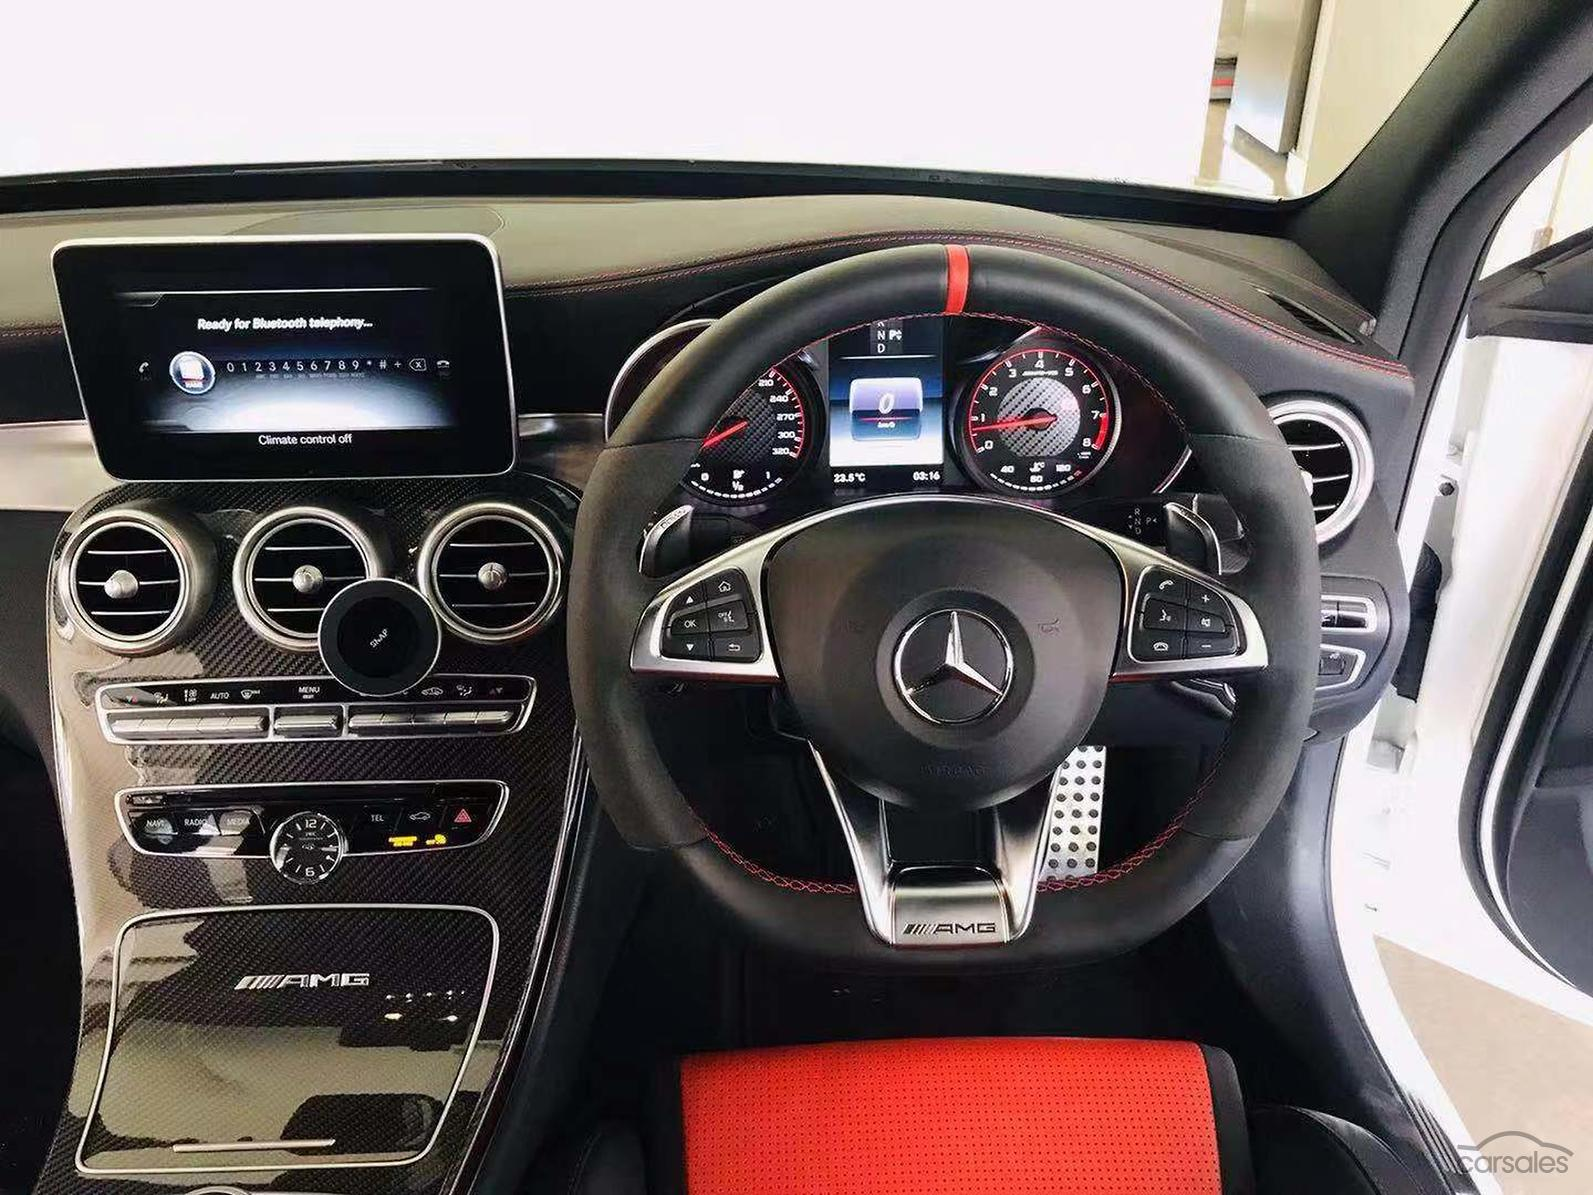 2016 Mercedes-Benz C63 AMG S Auto-SSE-AD-5754128 - carsales com au